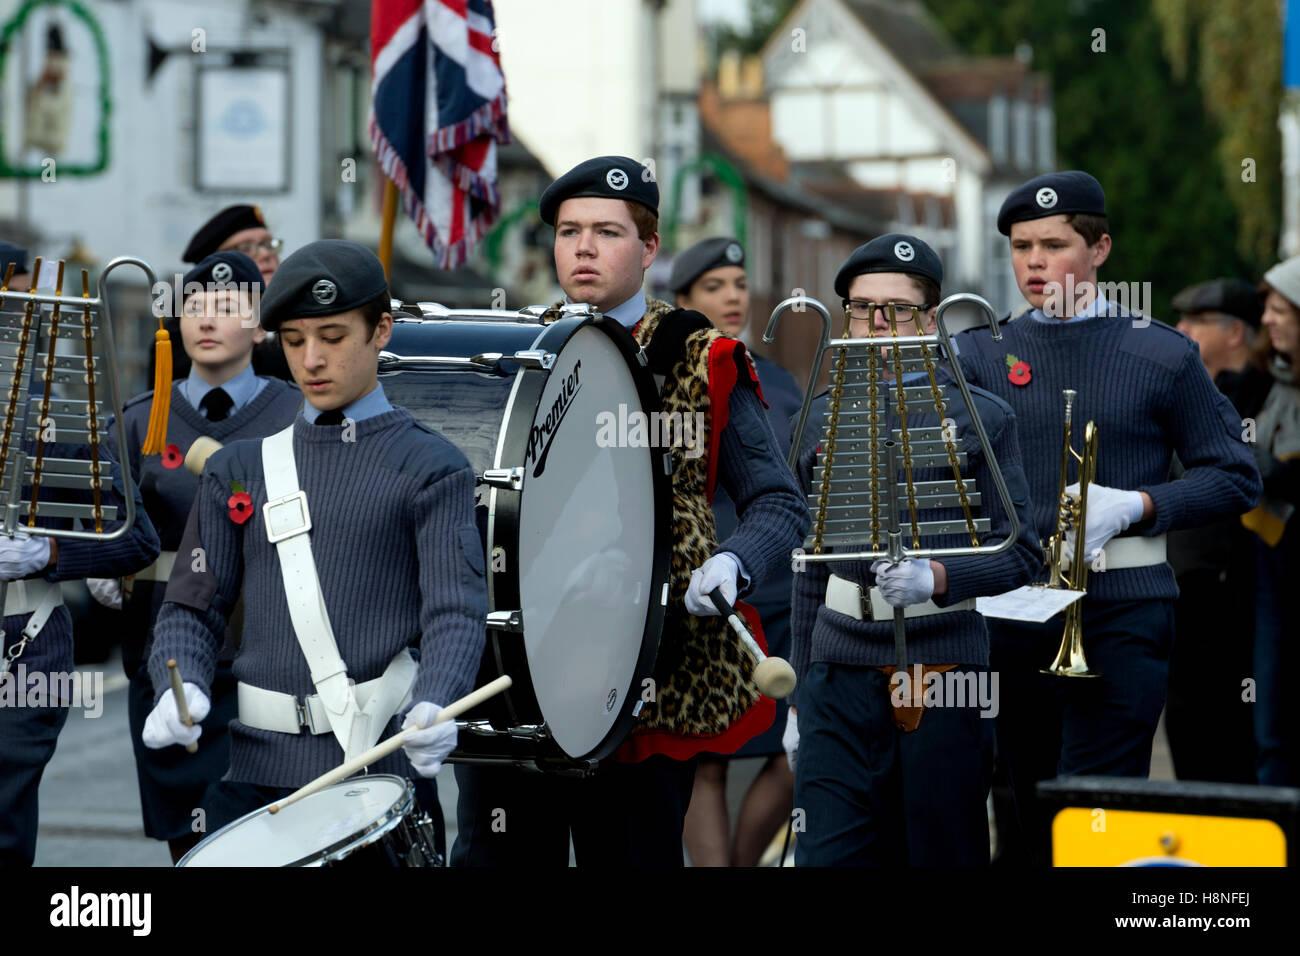 An air cadets band at the Stratford-upon-Avon Remembrance Sunday parade, Warwickshire, England, UK - Stock Image